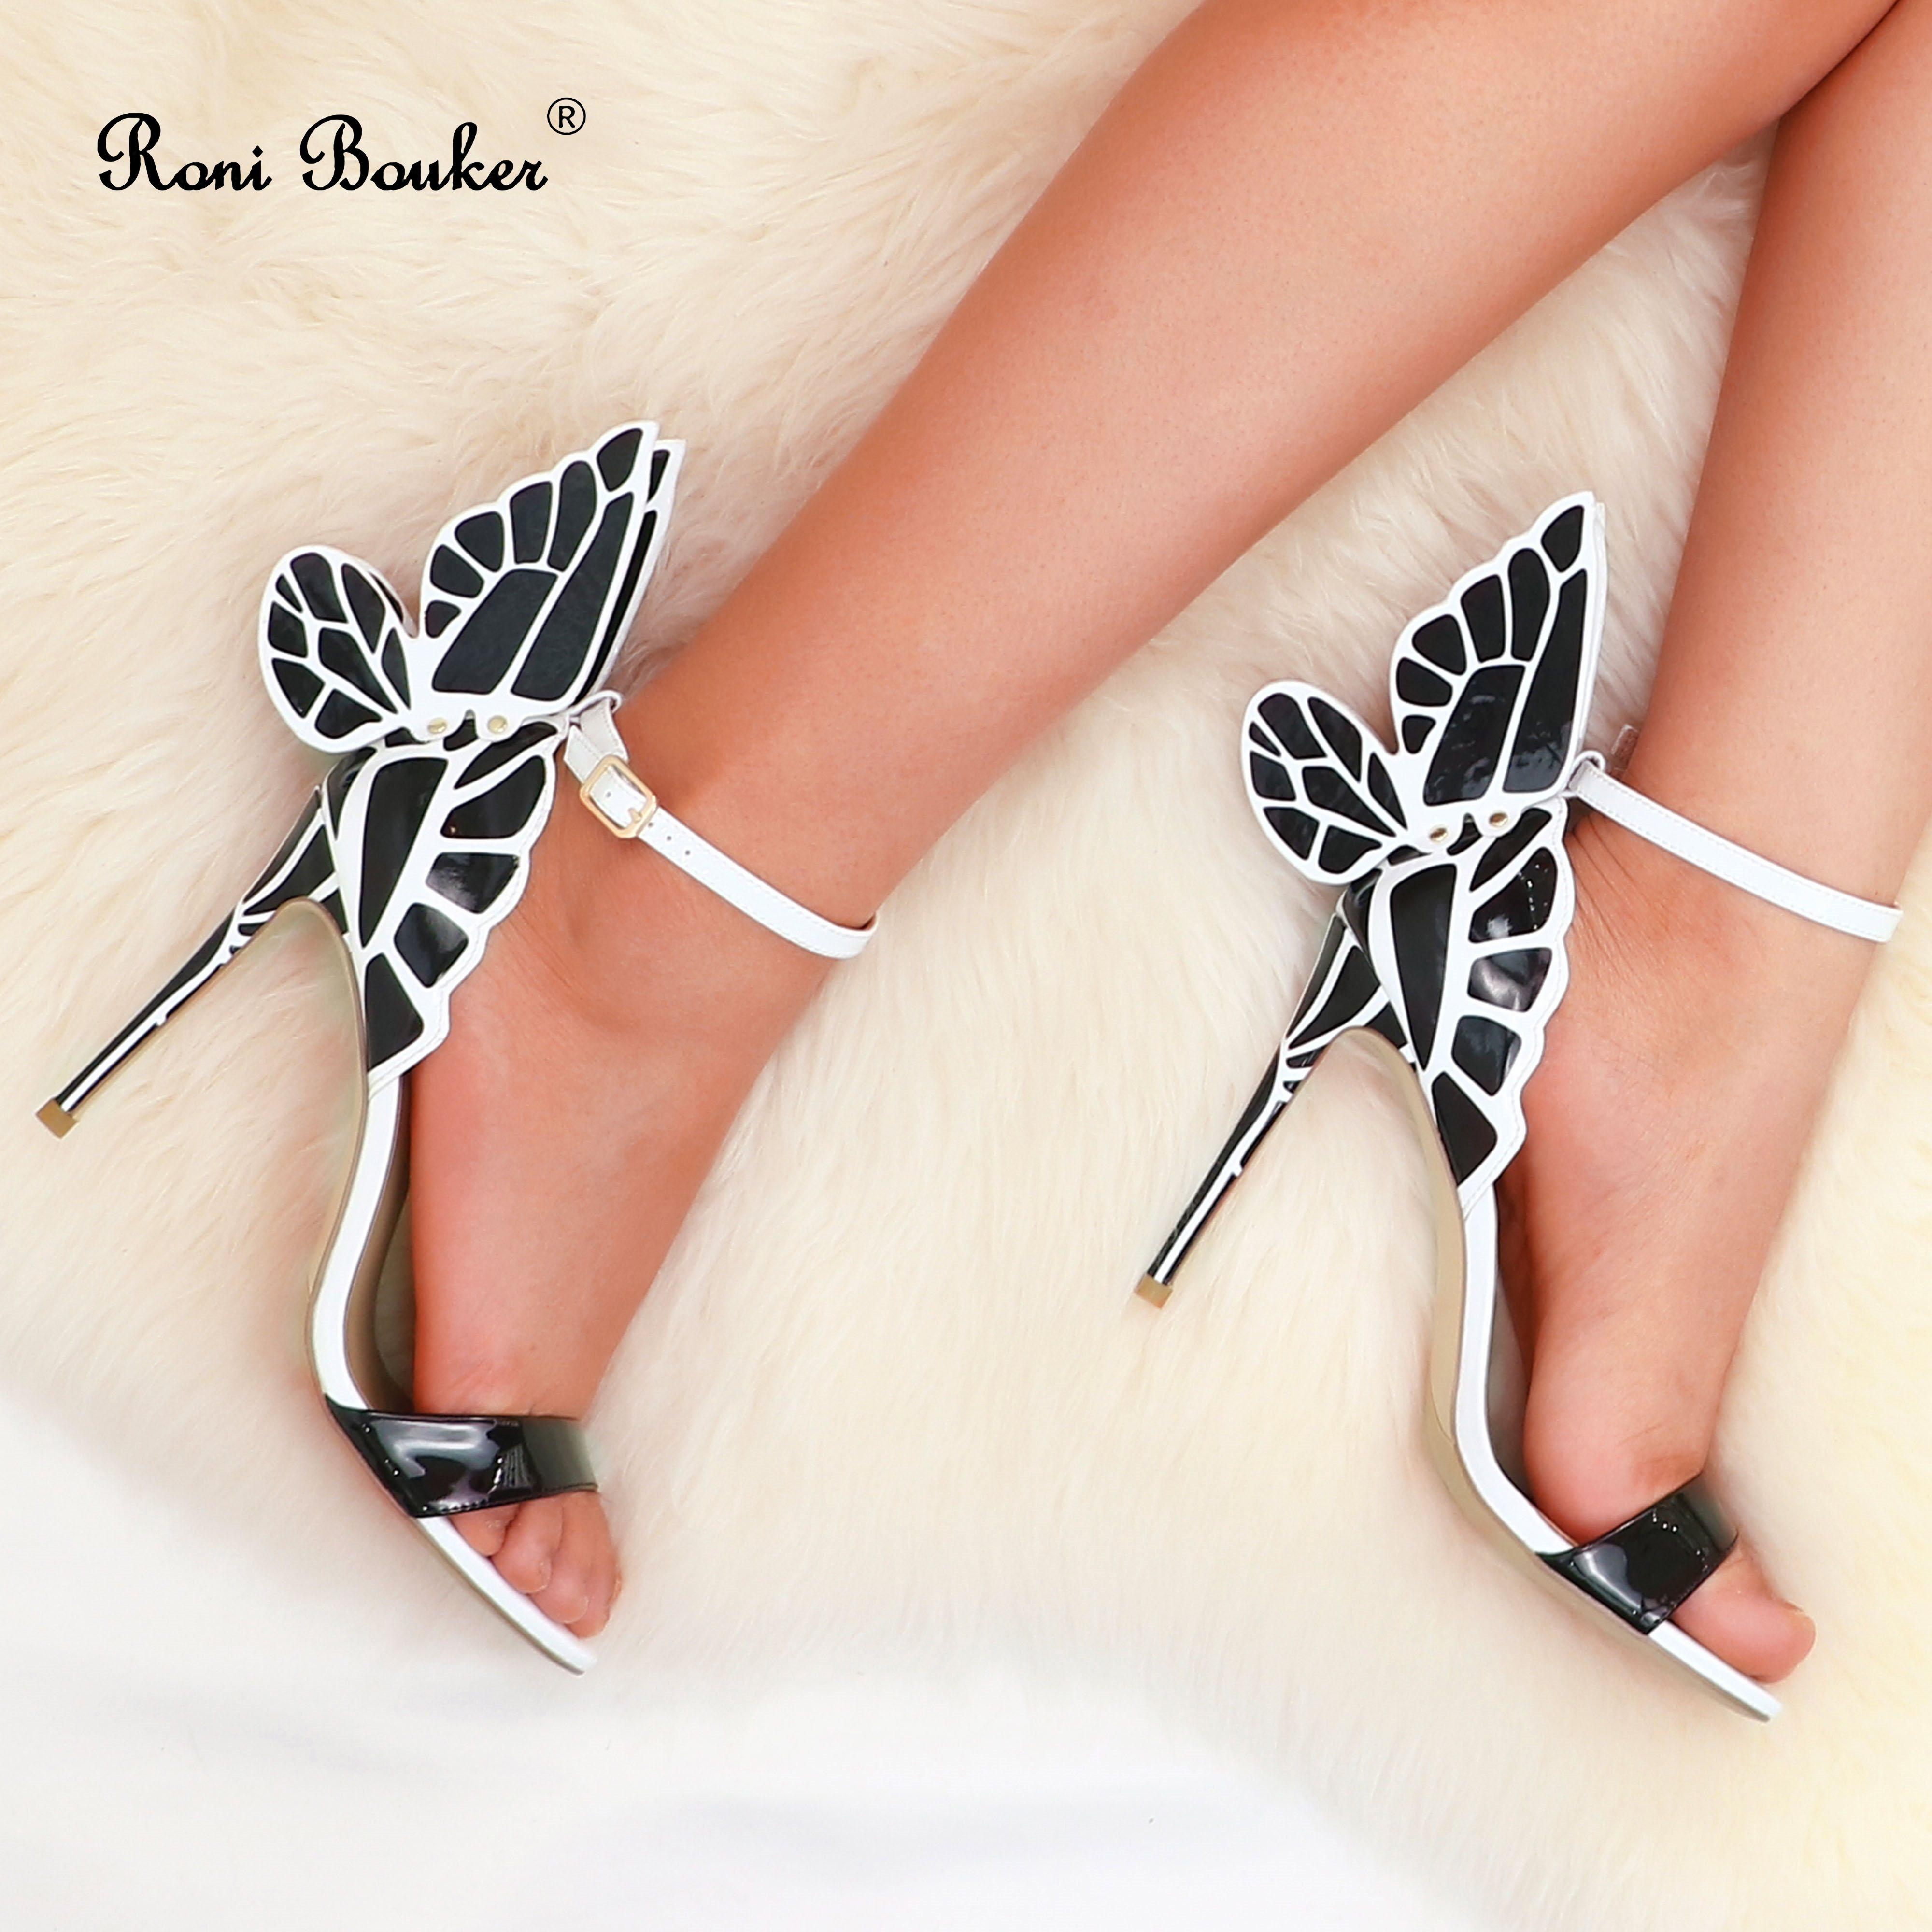 Roni Bouker Women Strappy Heels Woman Sandal High Heel Women s Wing Sandals Genuine Leather Summer